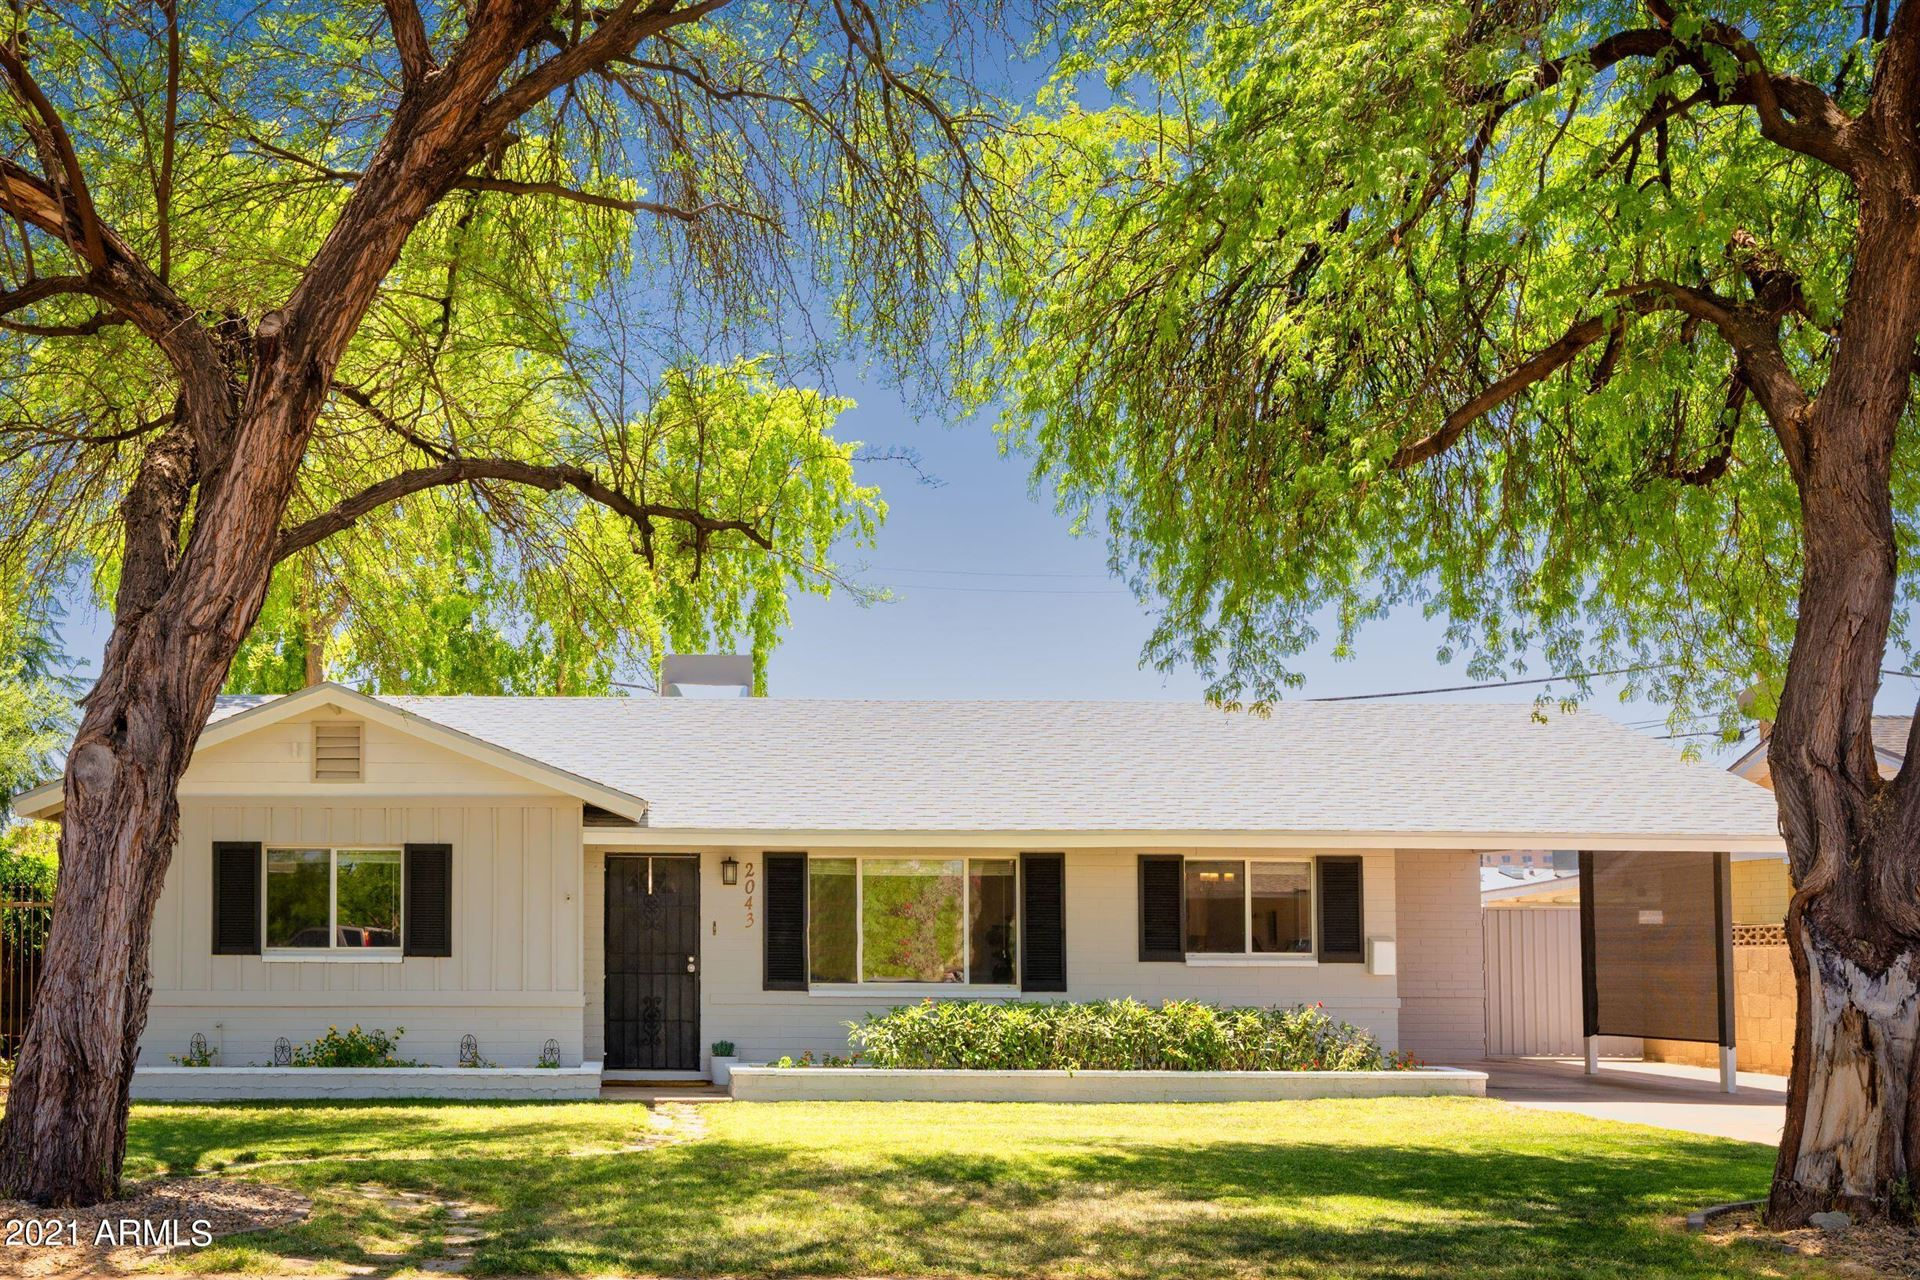 2043 E MULBERRY Drive, Phoenix, AZ 85016 - #: 6236464